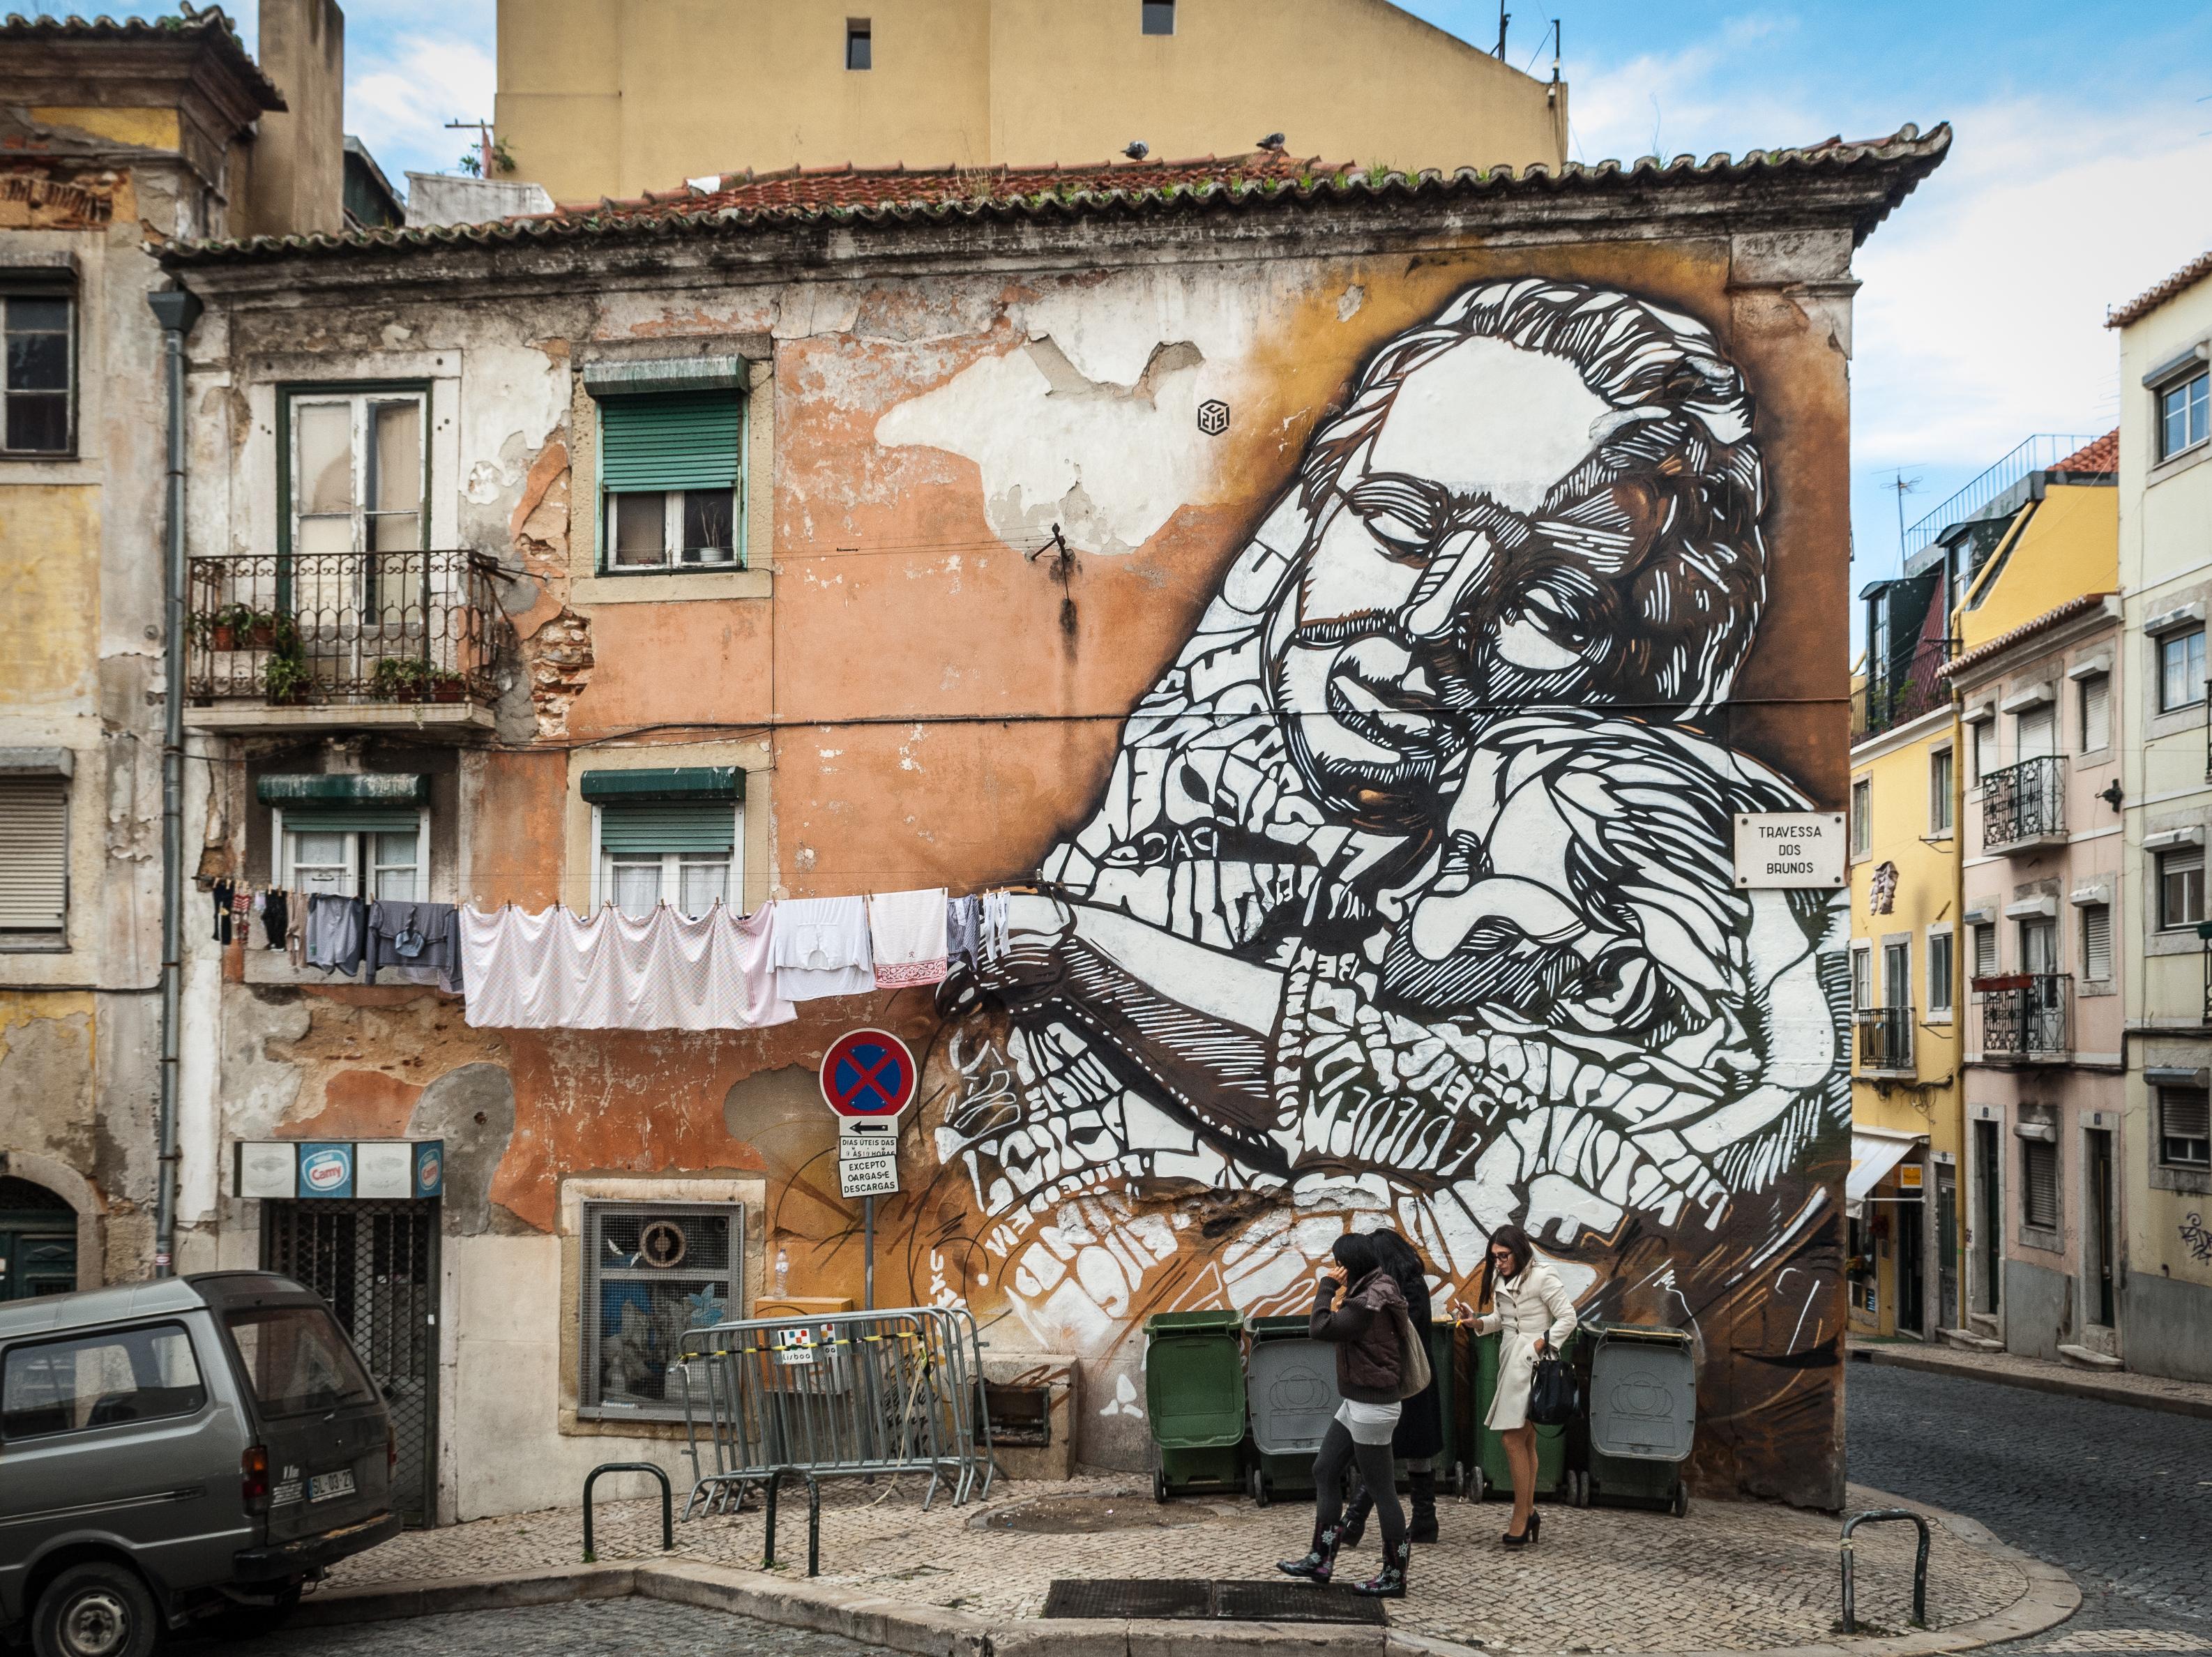 French street artist C215's work on the Calada da Pampulha in Lisbon.